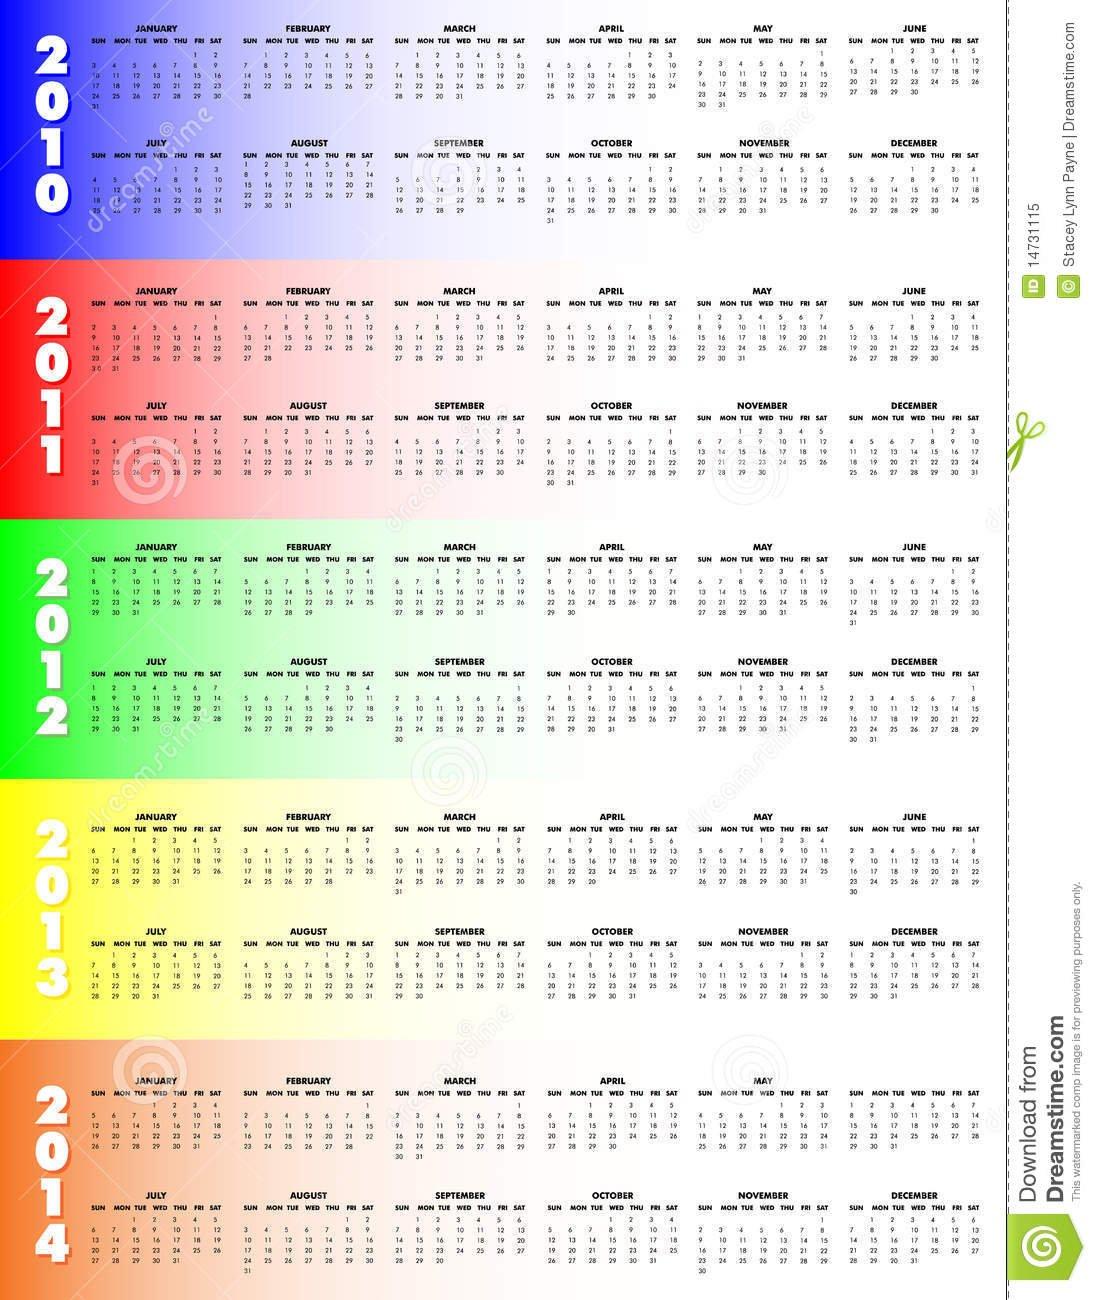 Five-Year Calendar 2010-2014 - Stock Vector - Illustration Five Year Countdown Calendar